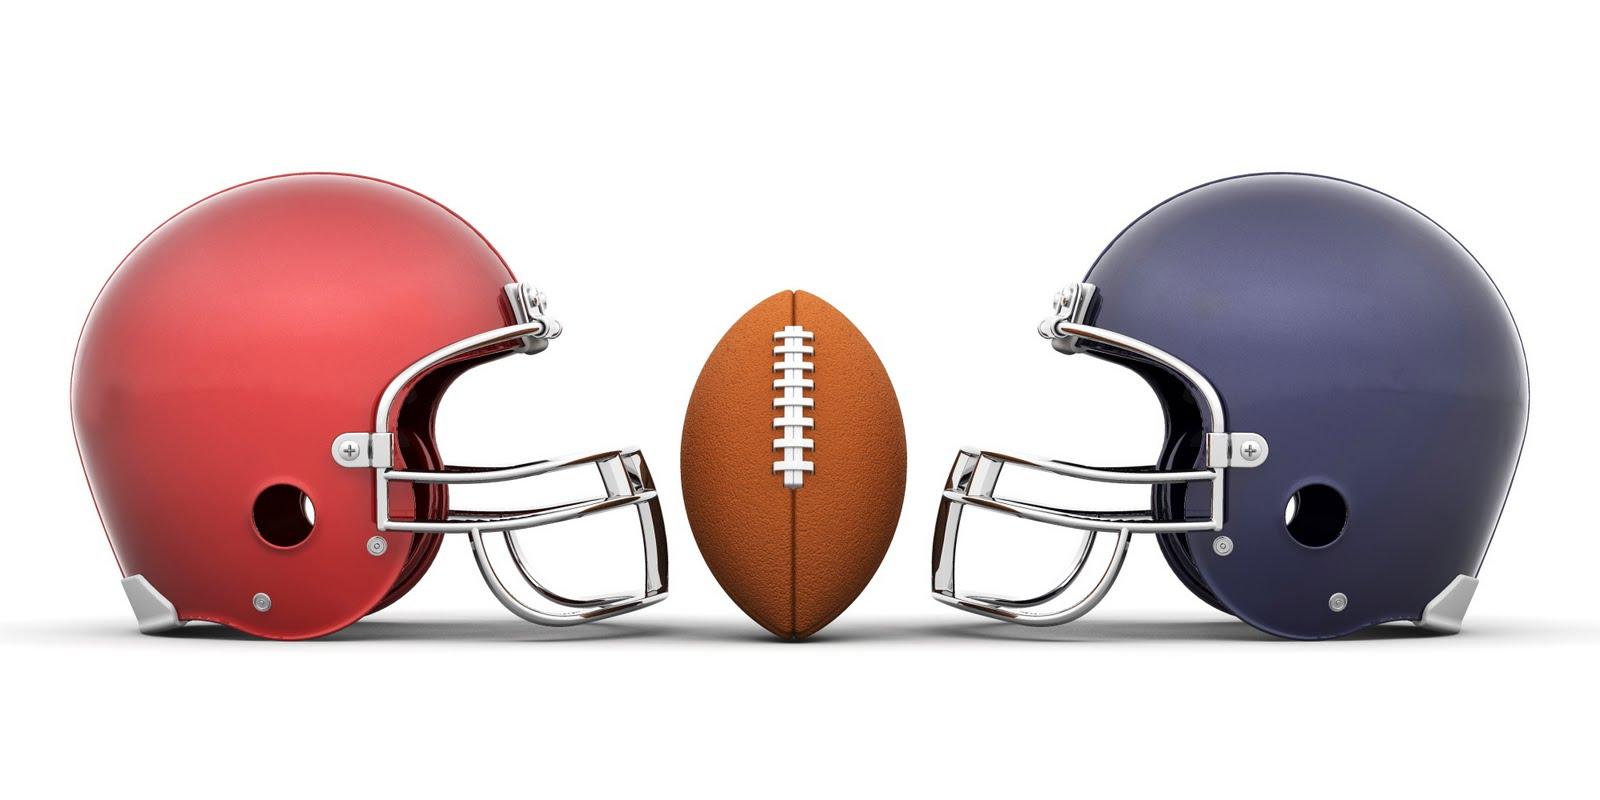 American Football Ball Wallpaper: FULL WALLPAPER: American Football